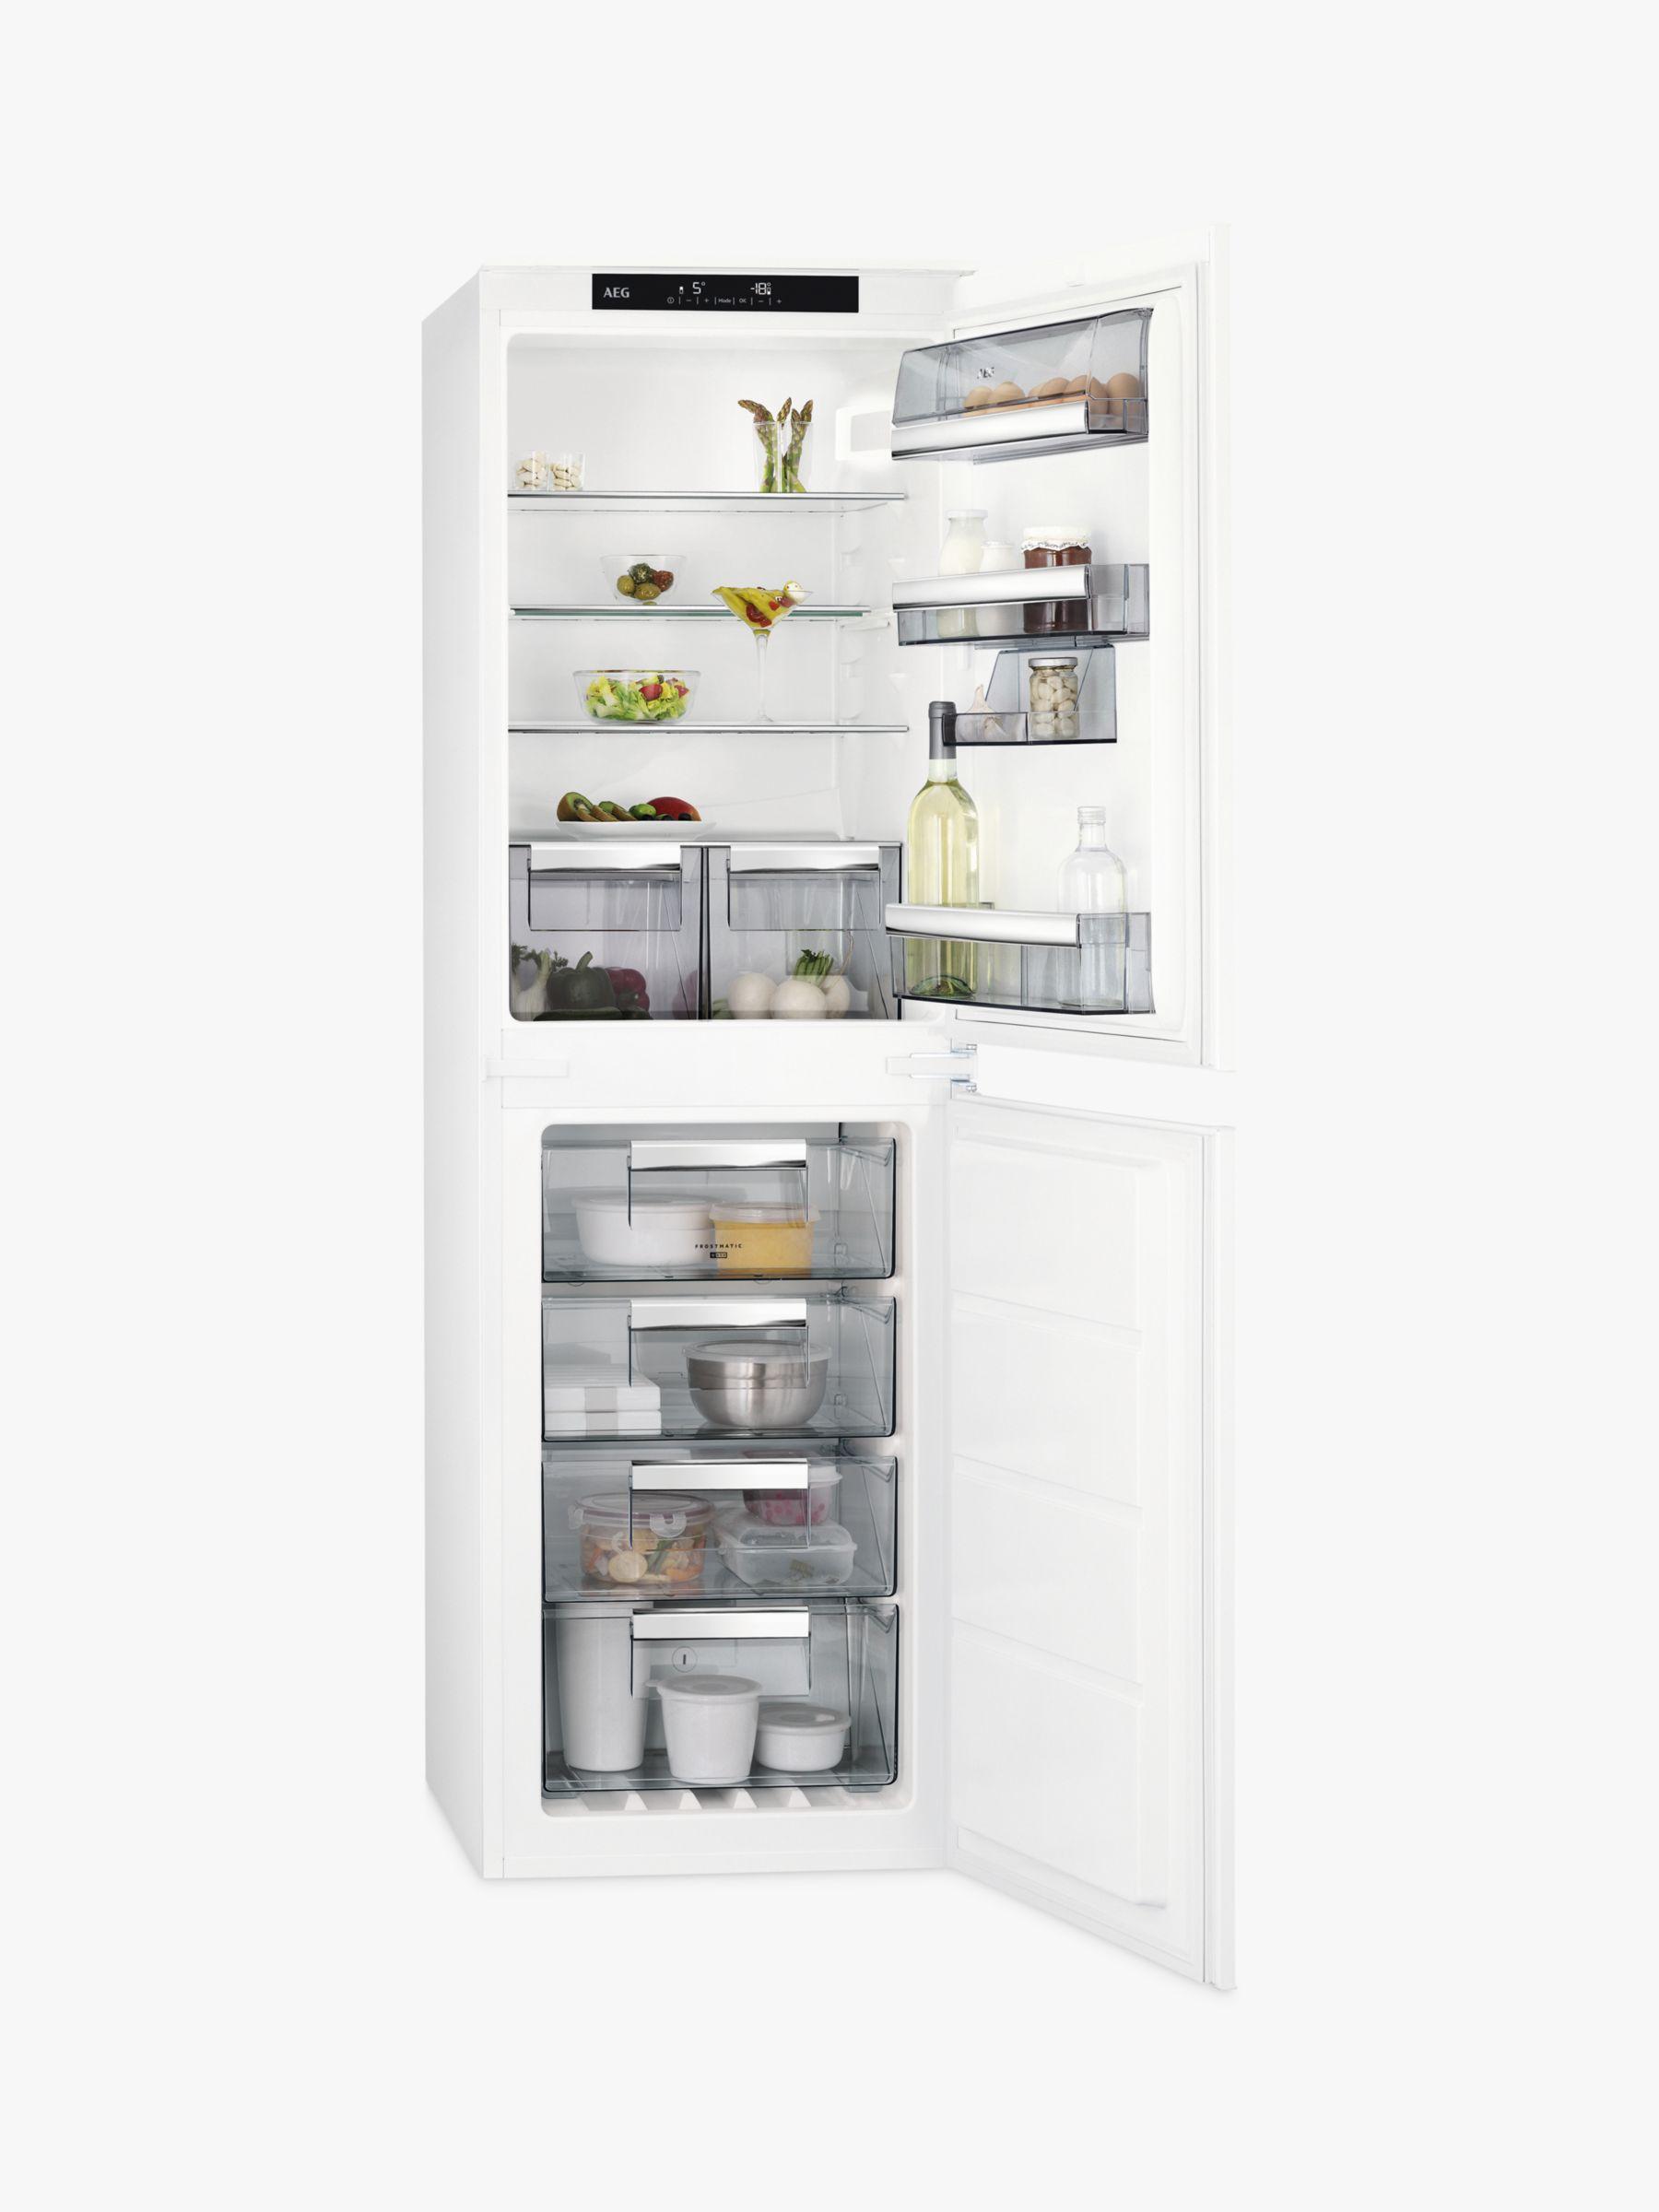 AEG AEG SCE8181VNS Integrated Fridge Freezer, A+ Energy Rating, 54cm Wide, White